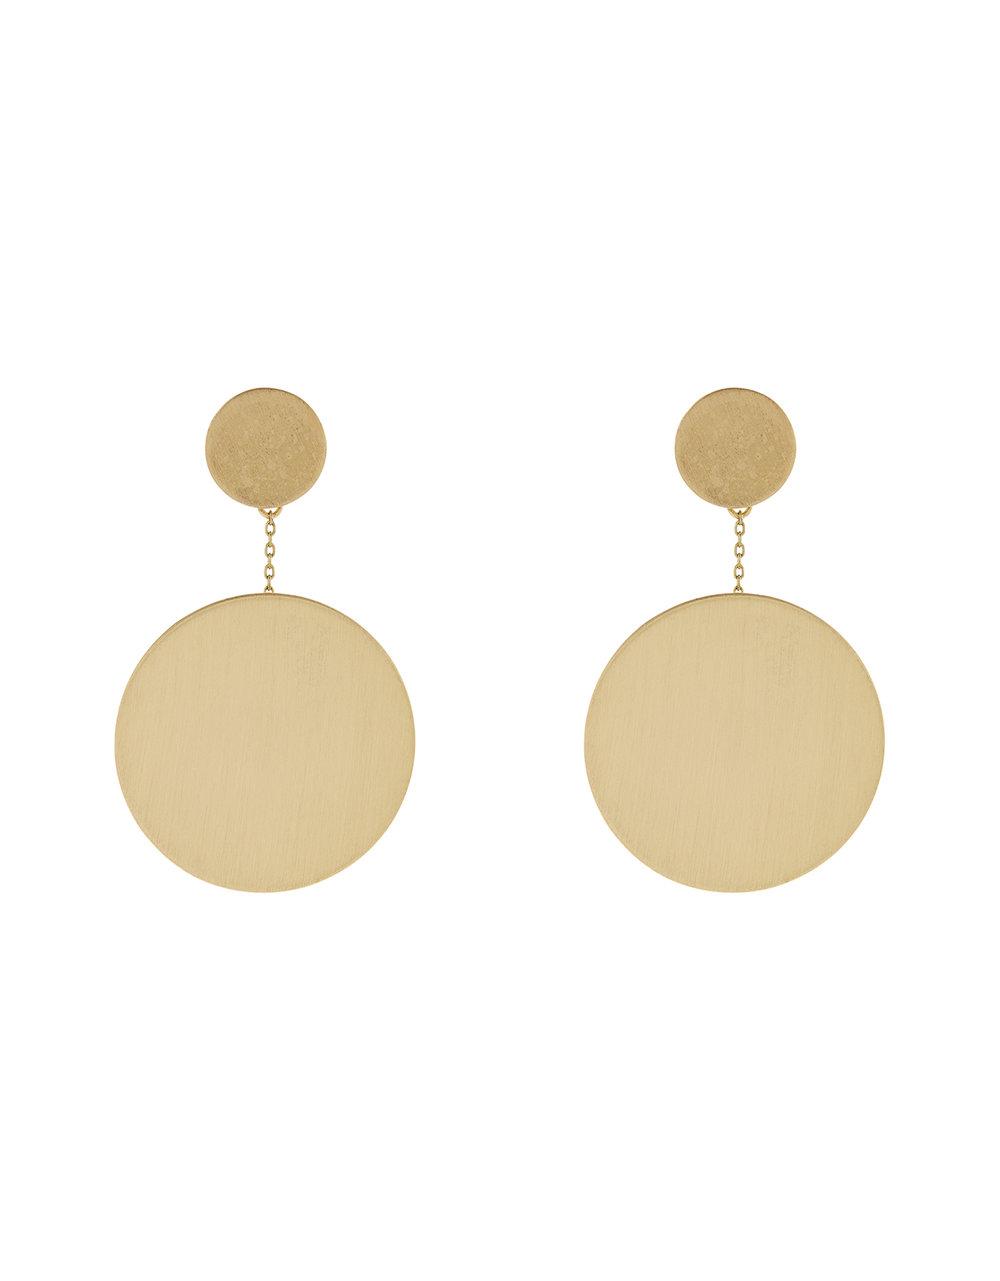 Accessorize Brush Disc Drop Earrings